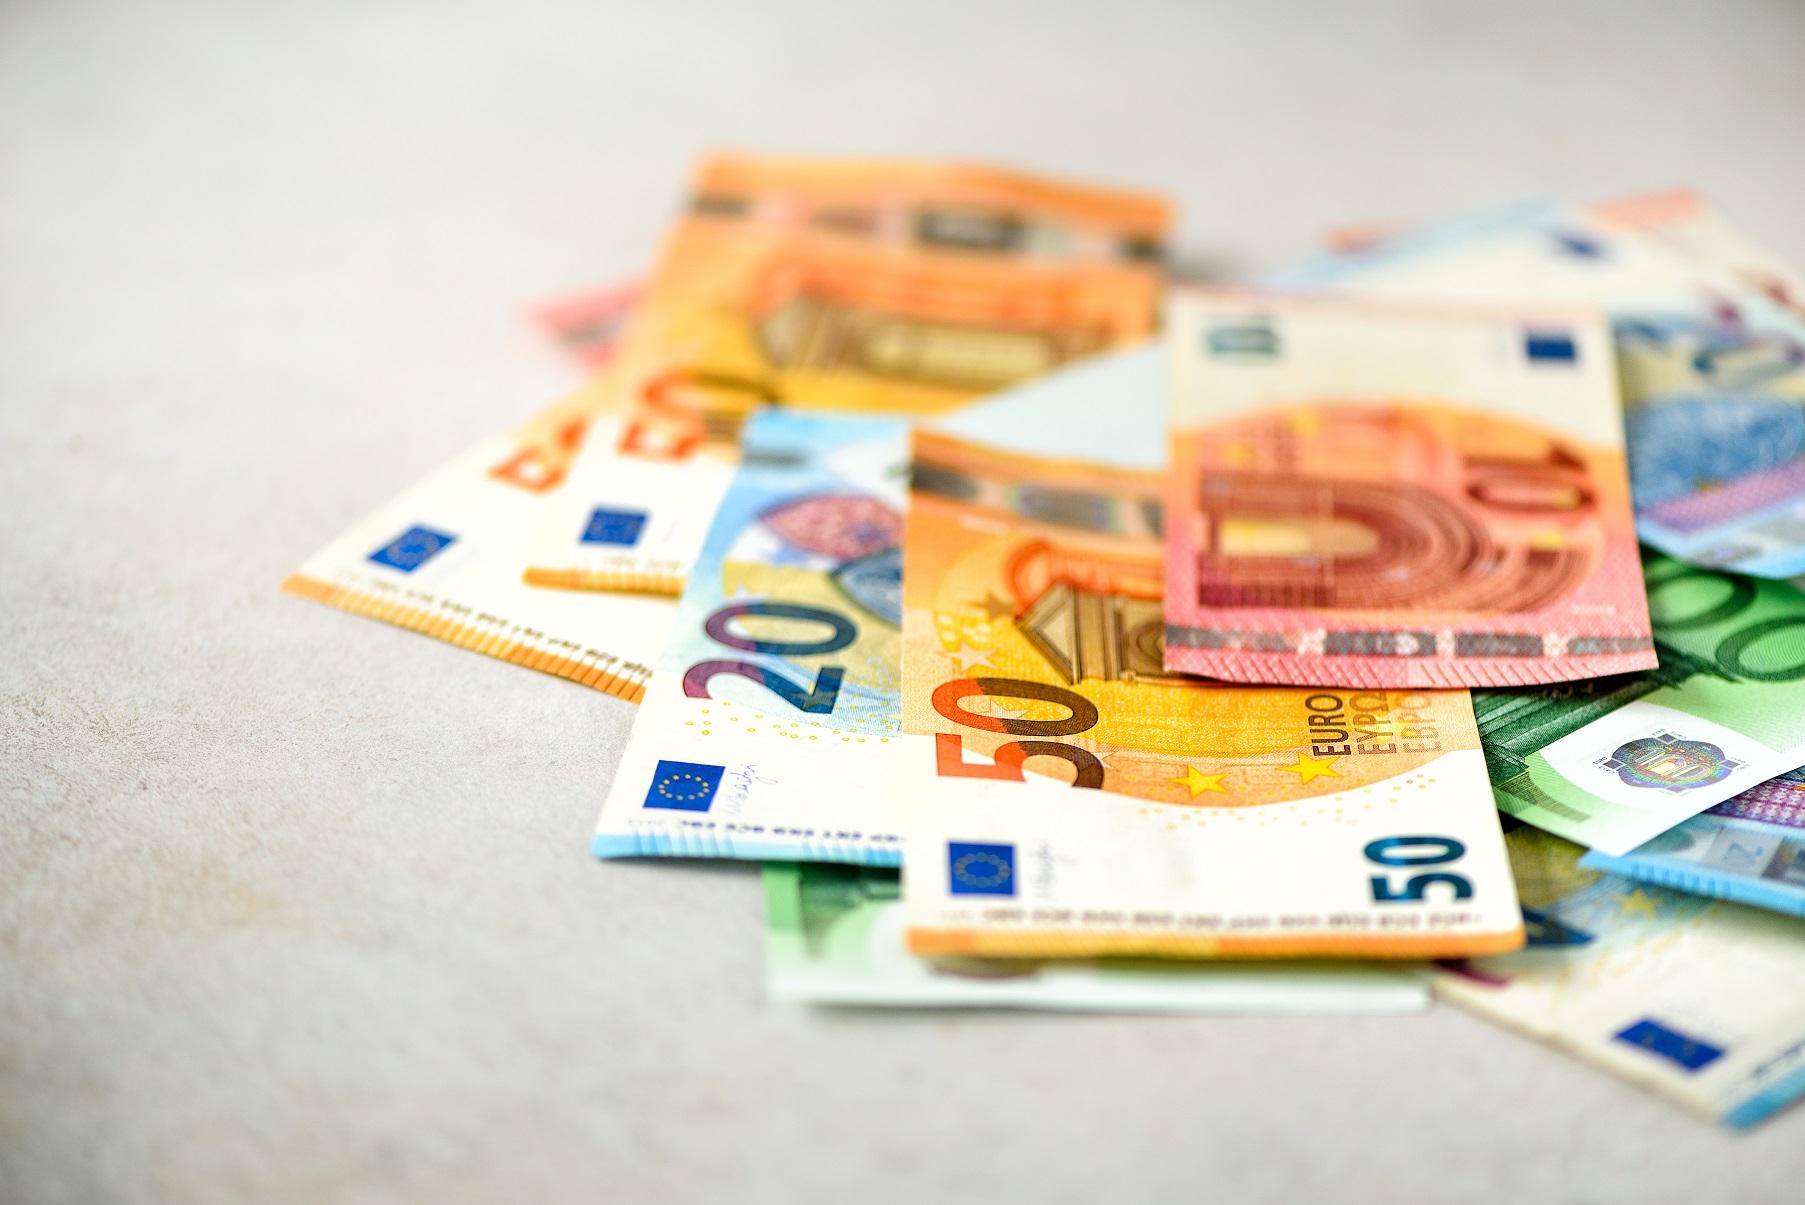 Leader in money transfers